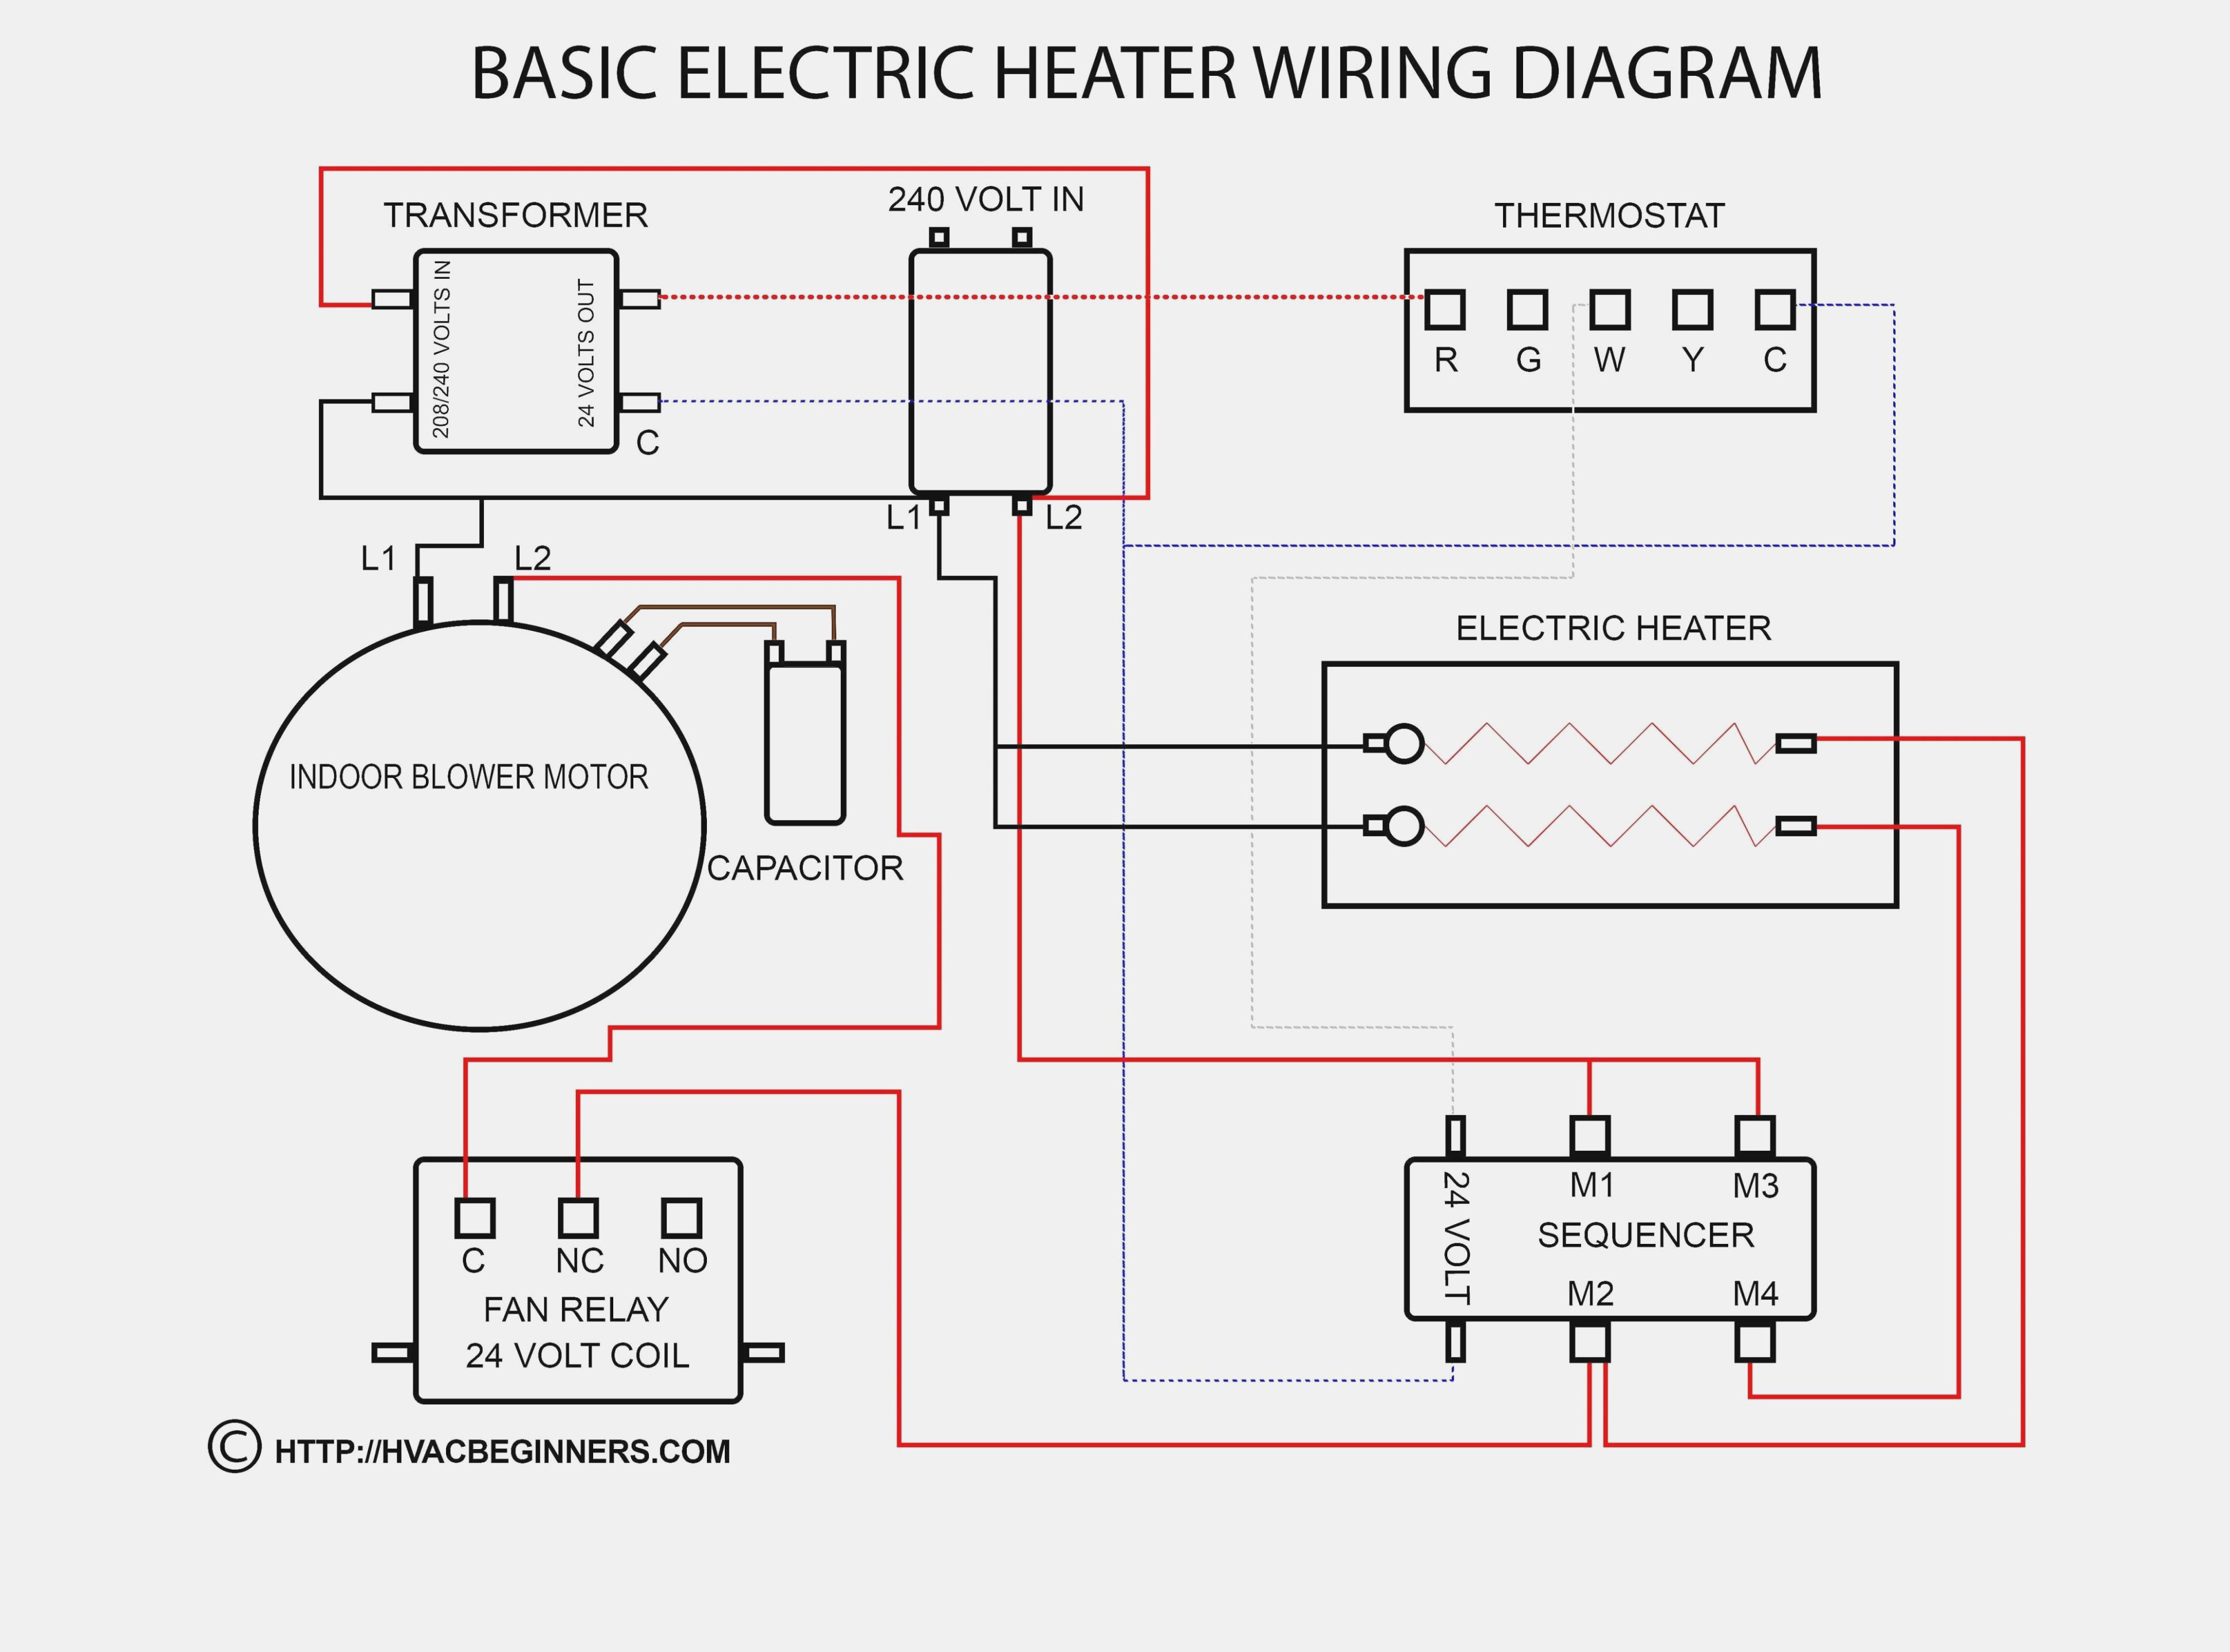 17 Innovative Circuit Diagram Ideas Electrical Circuit Diagram